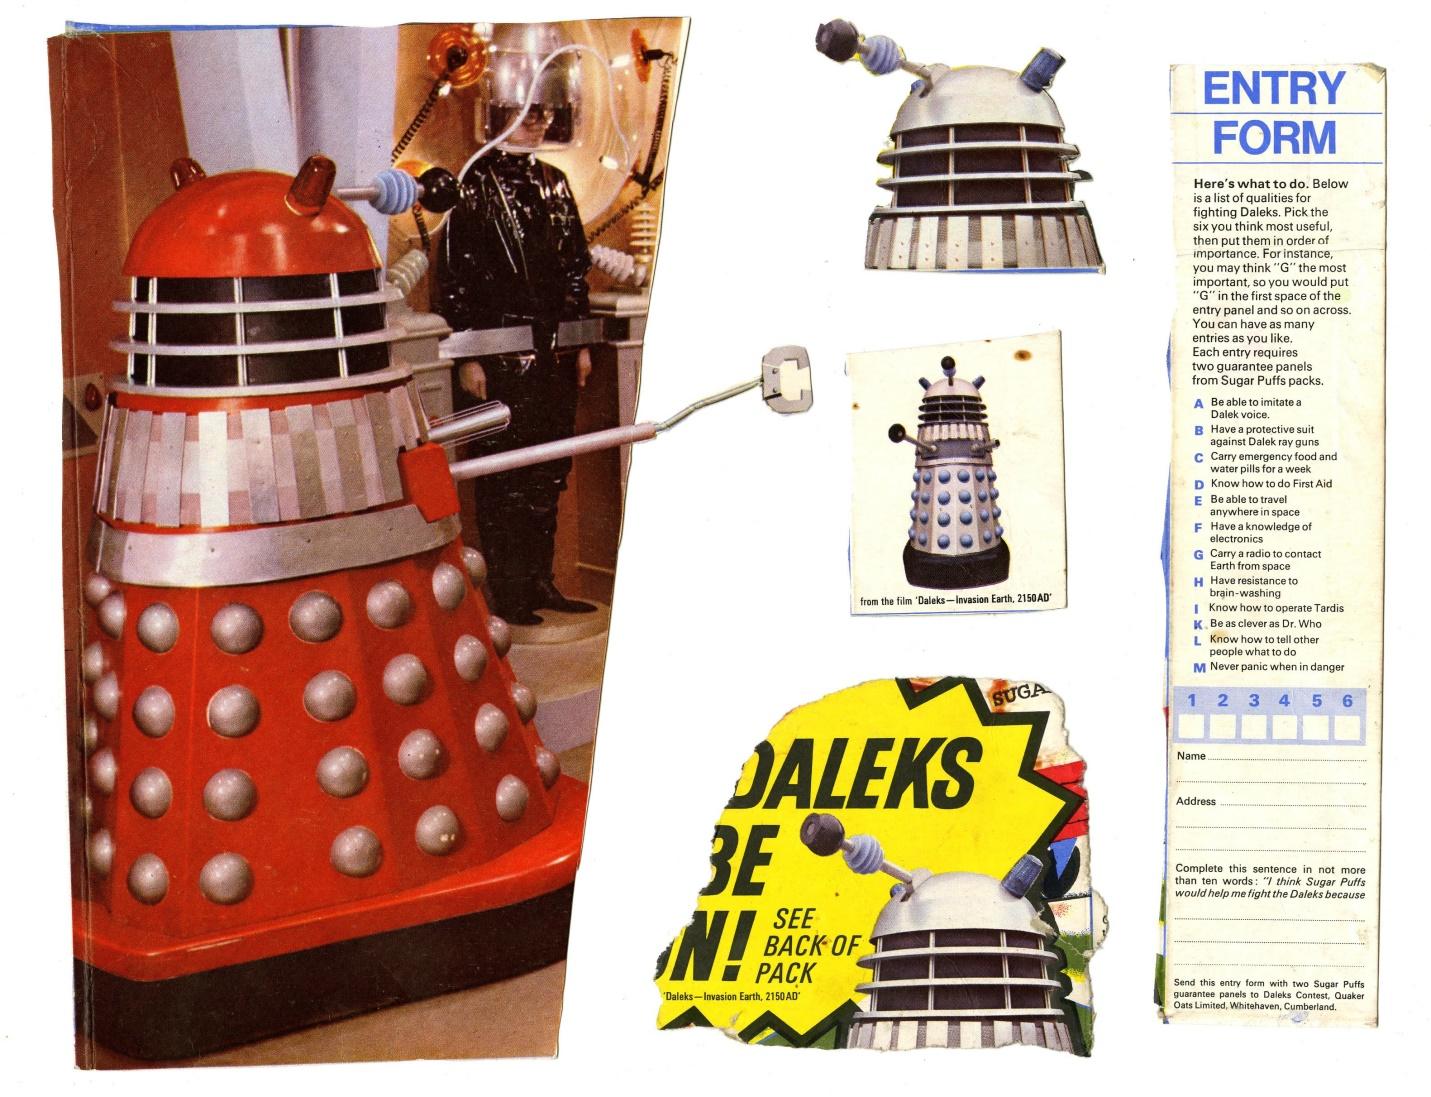 Quaker Oats, Sugar Puffs Win a Dalek competition, box parts